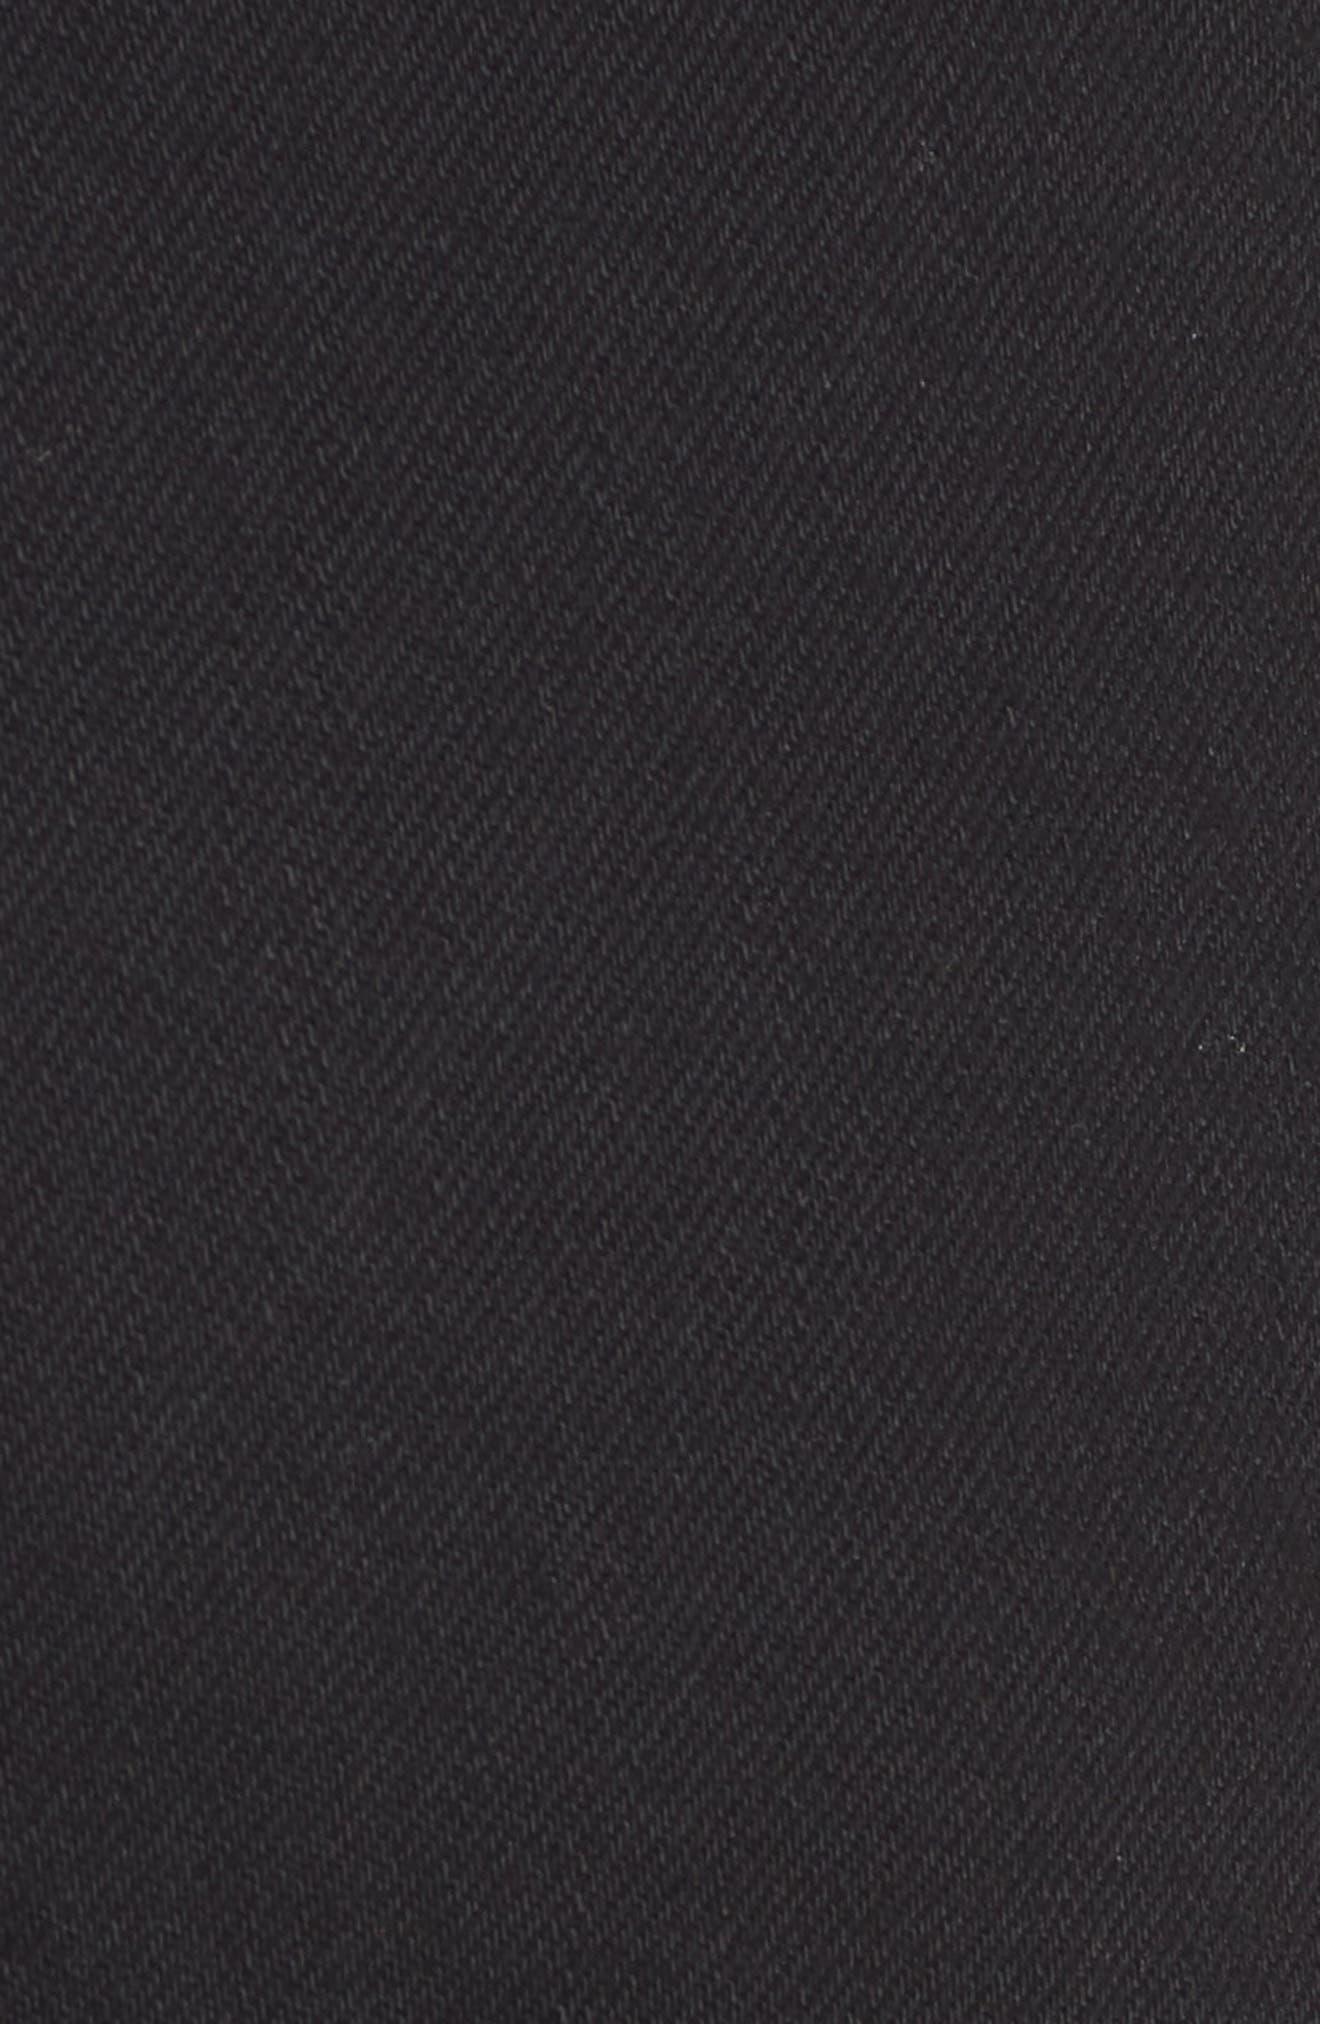 Mavi Pixie Roll Cuff Denim Shorts,                             Alternate thumbnail 5, color,                             BLACK NOLITA